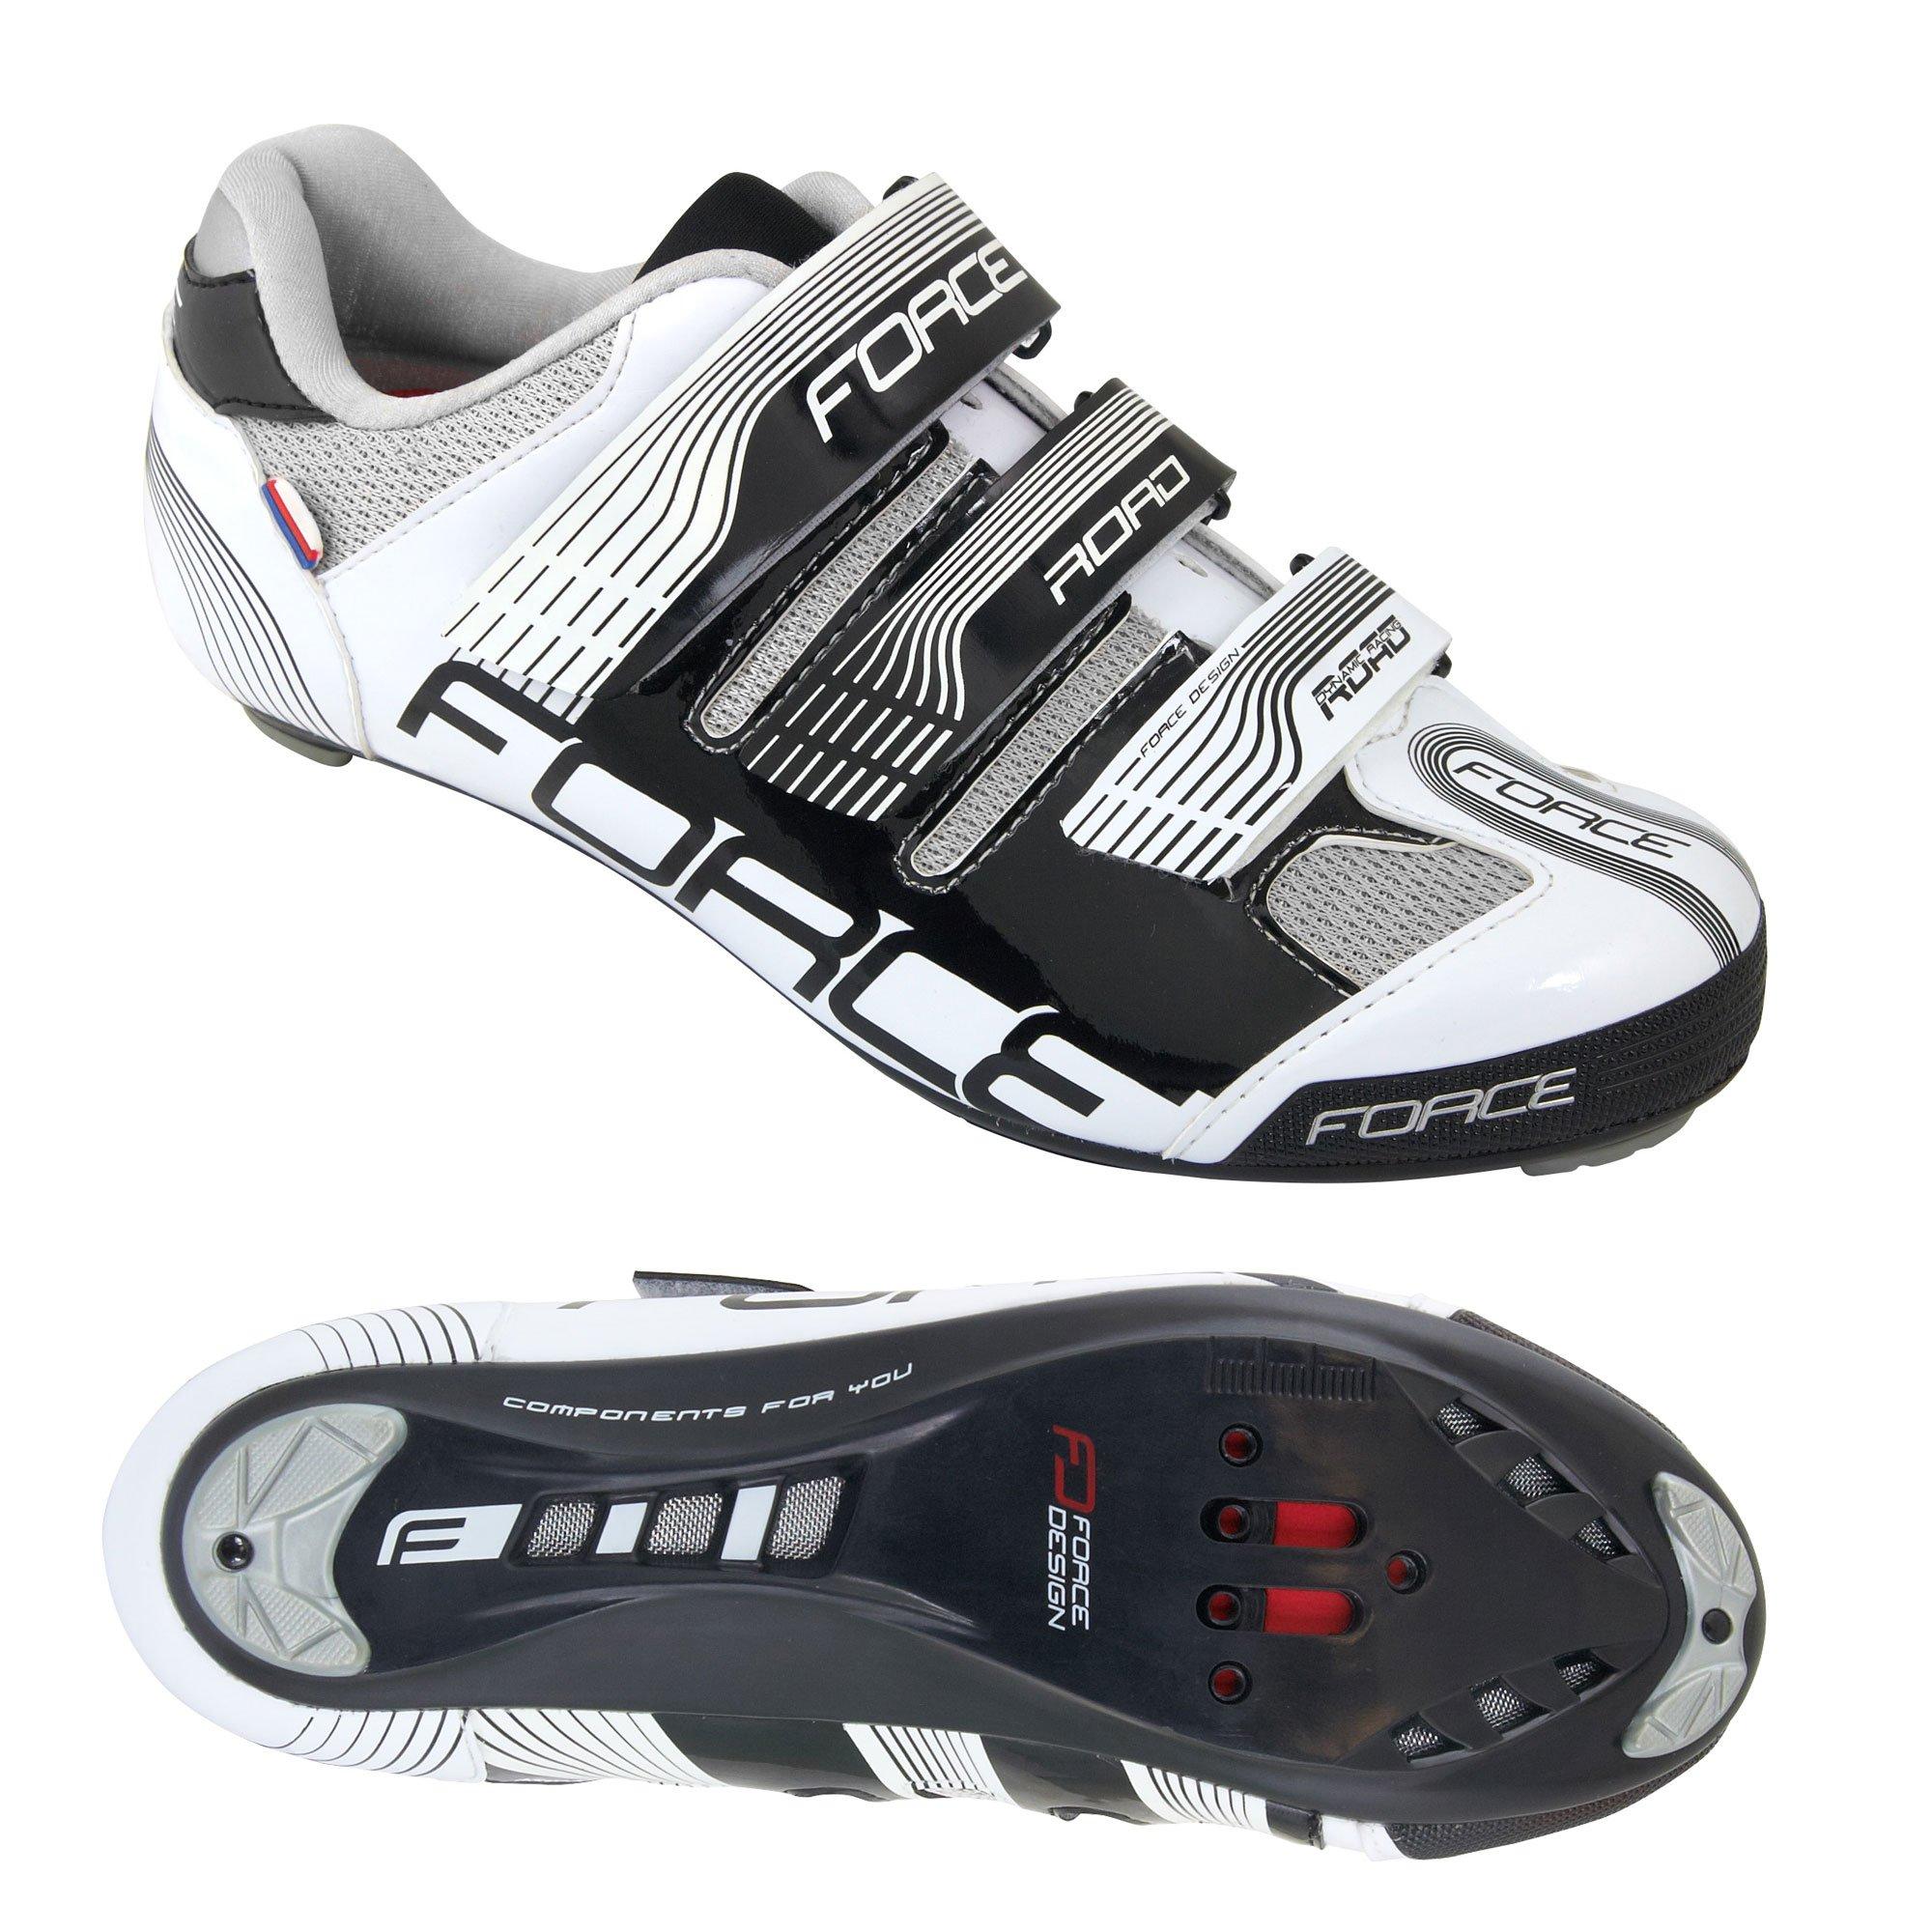 Force Road racer sko sort/hvid | Sko